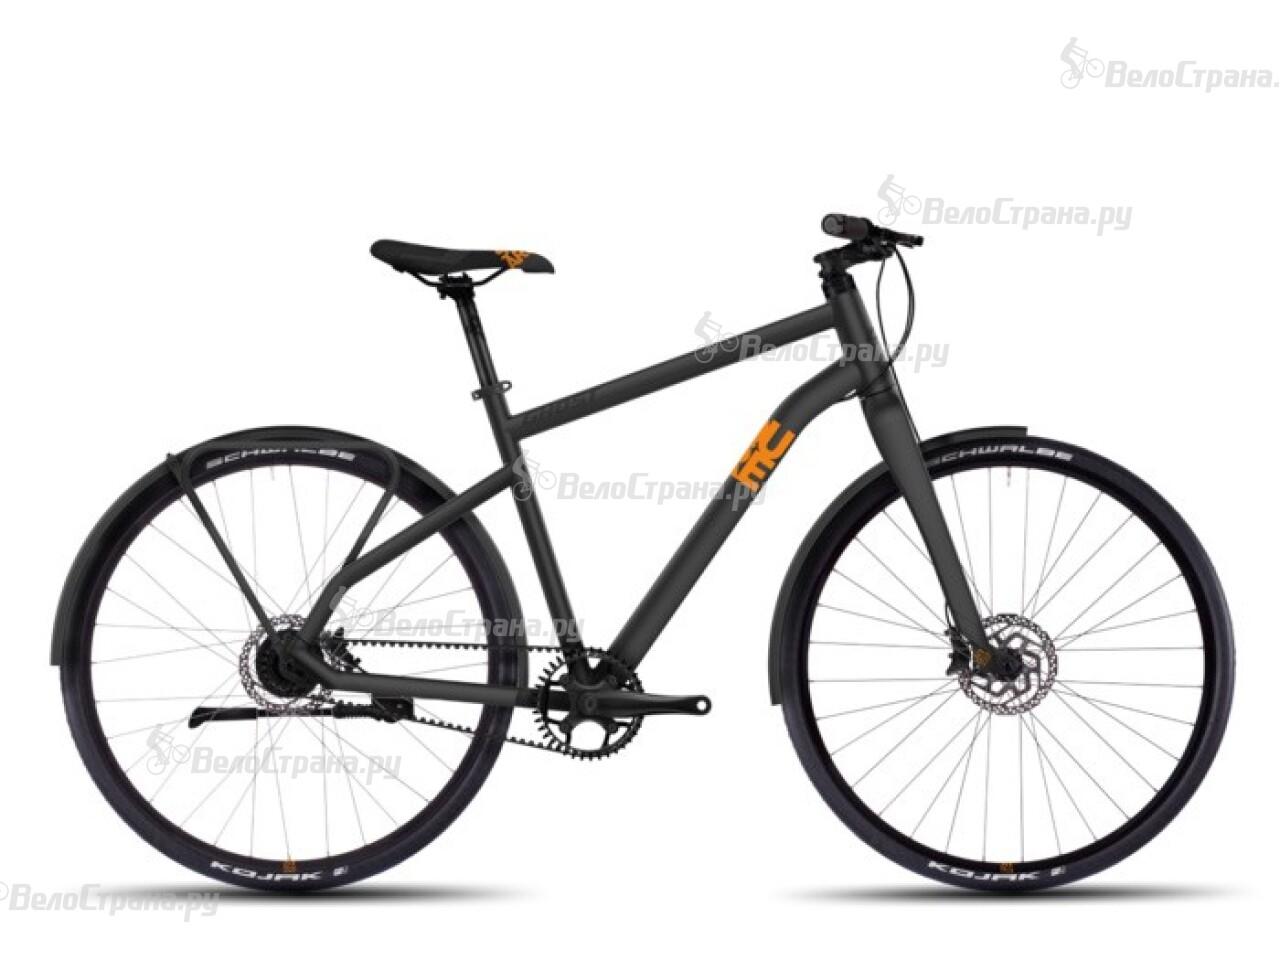 Велосипед Ghost SQUARE Urban 6 (2016) цены онлайн